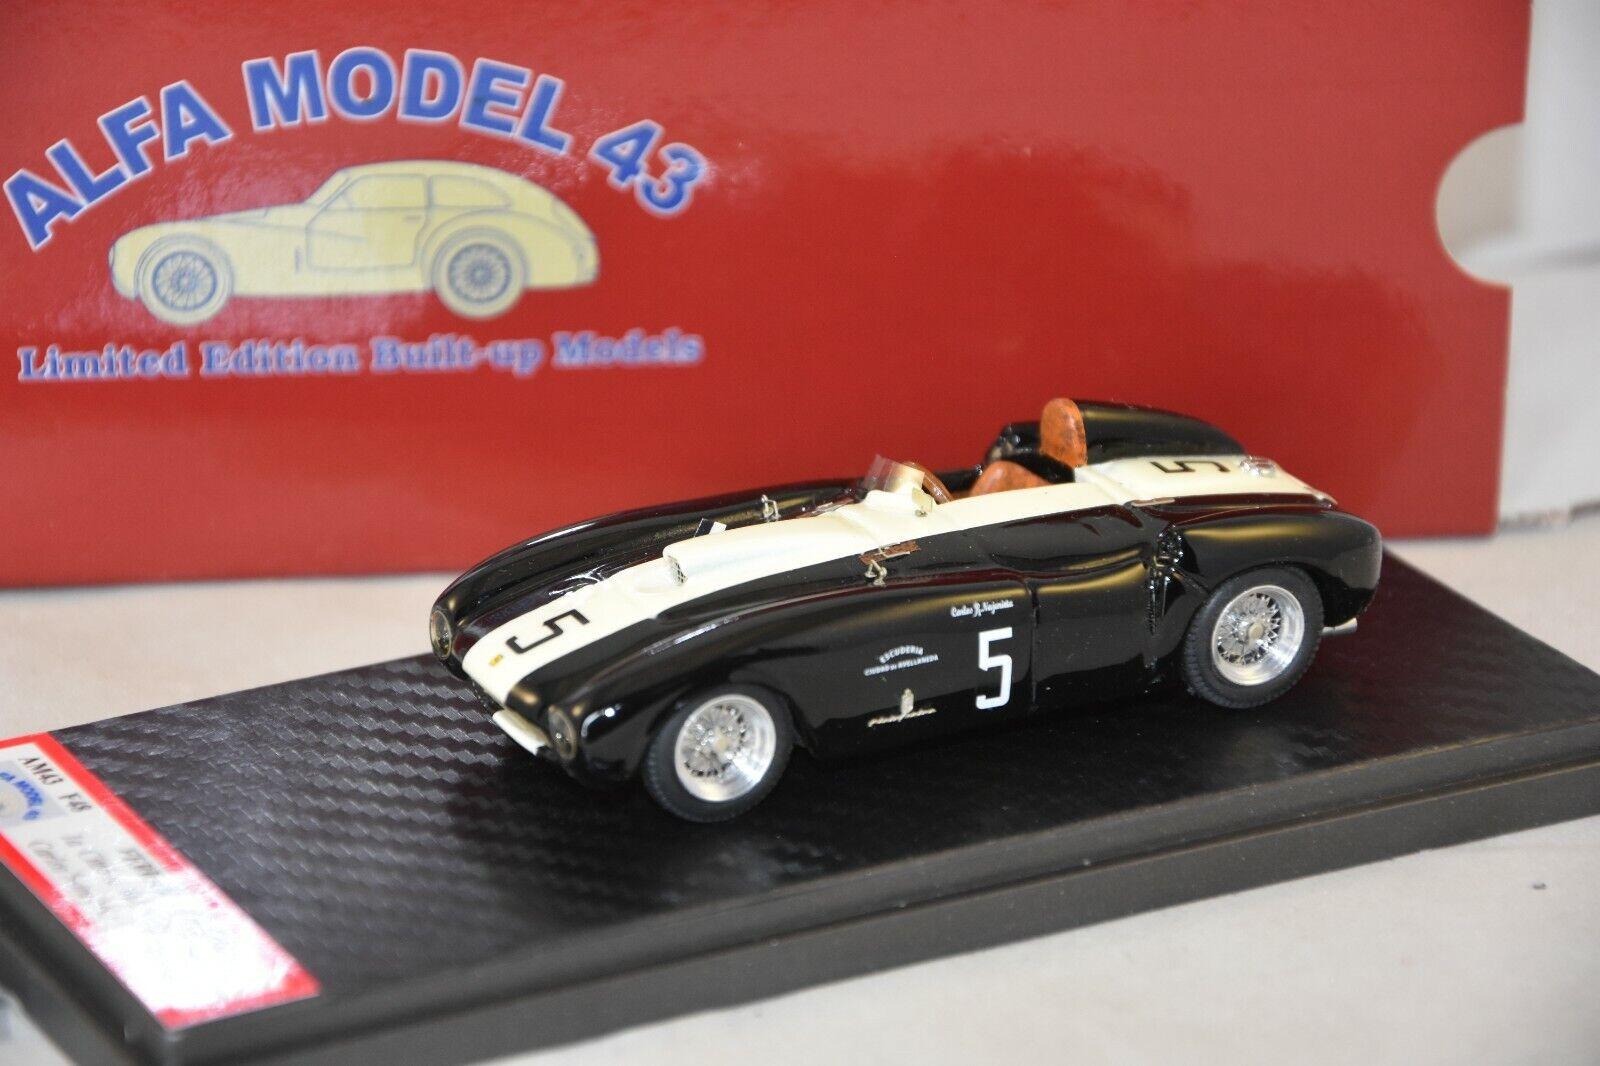 ALFA Modelll F48 - FERRARI 375MM vainqueur Buenos Aires 1955 N°5  1 43